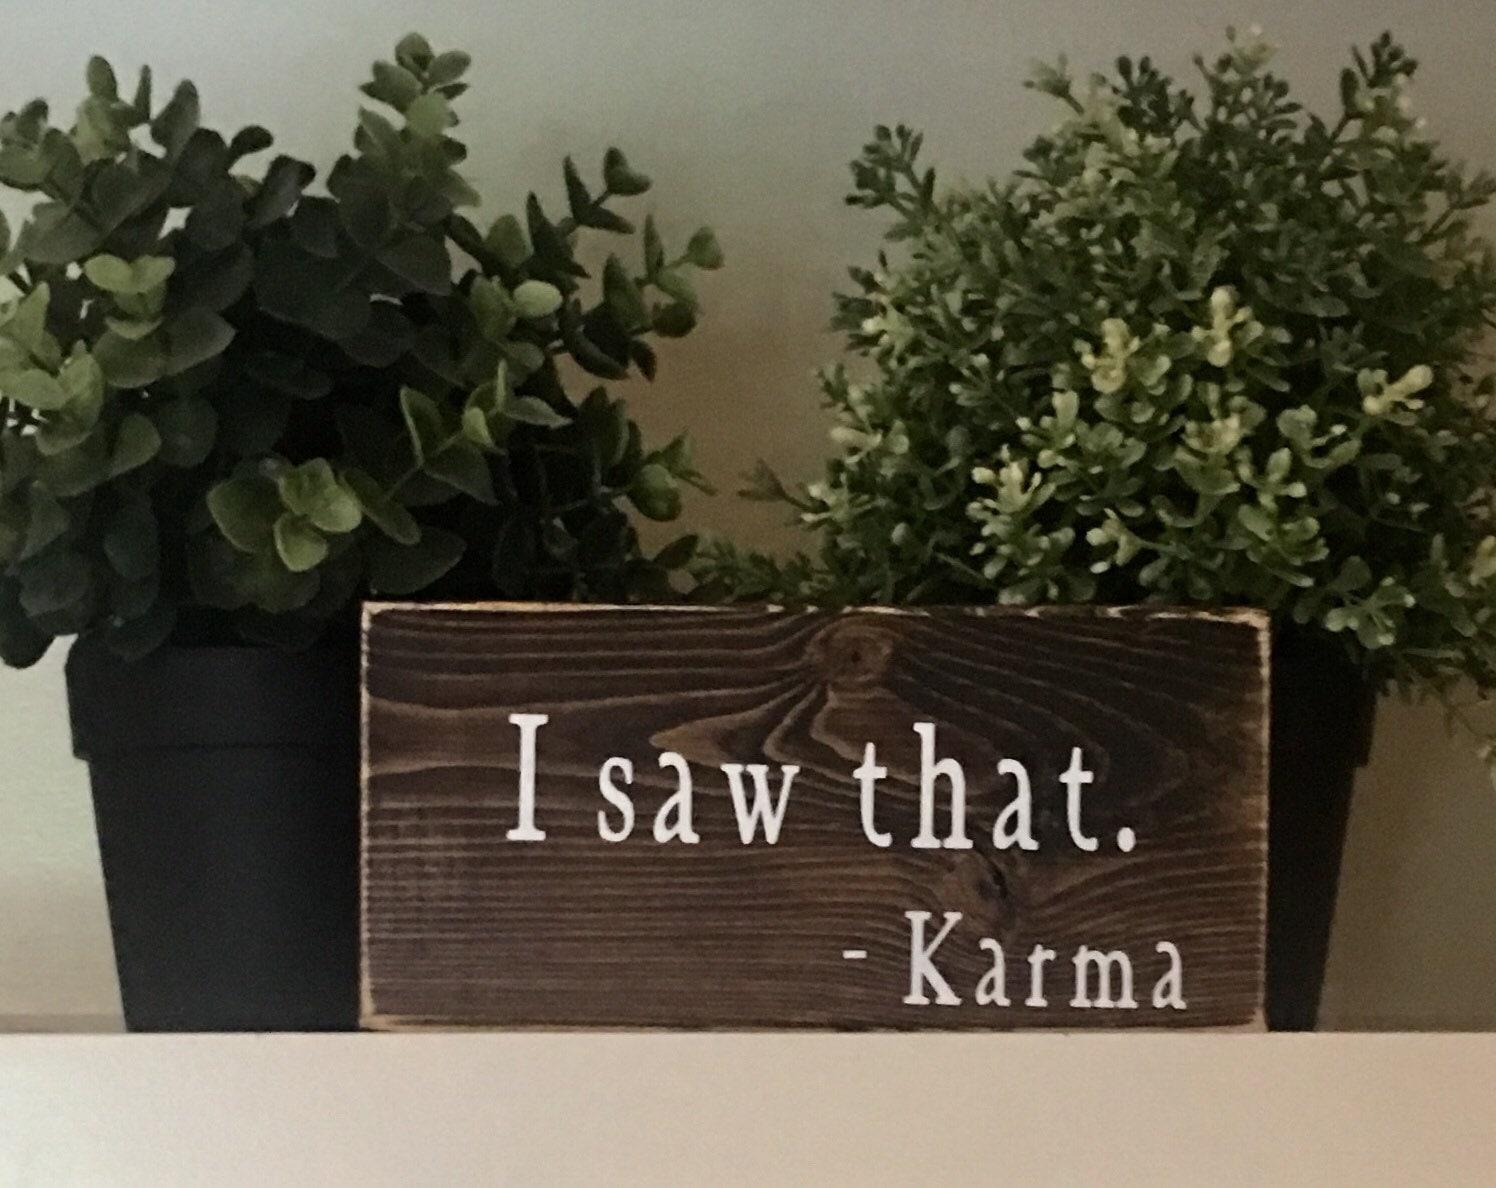 I Saw That Karmafunny Quotes About Karmawood Signsfunny Etsy